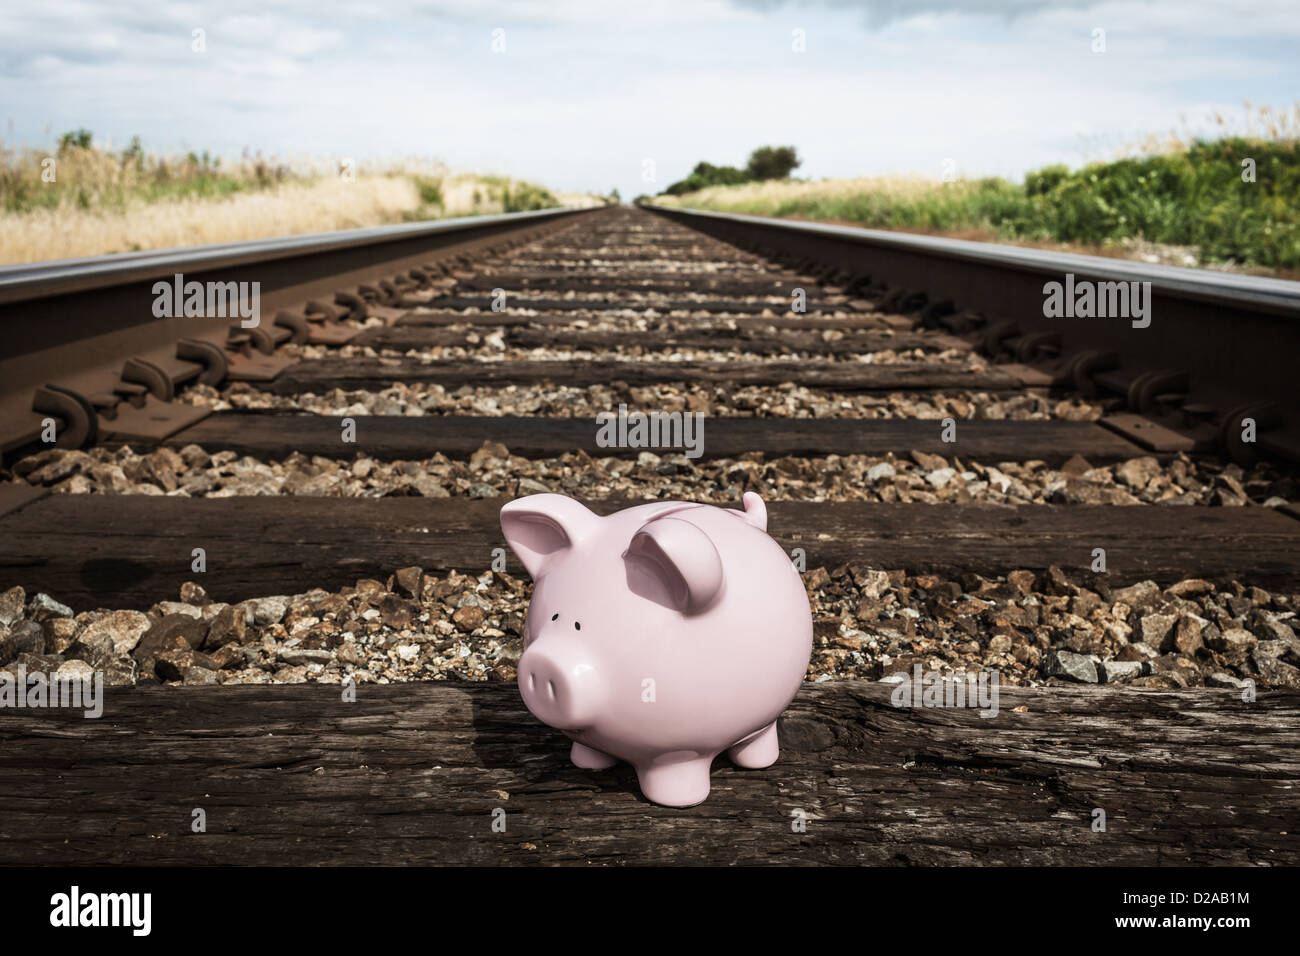 Piggy bank on railroad tracks - Stock Image